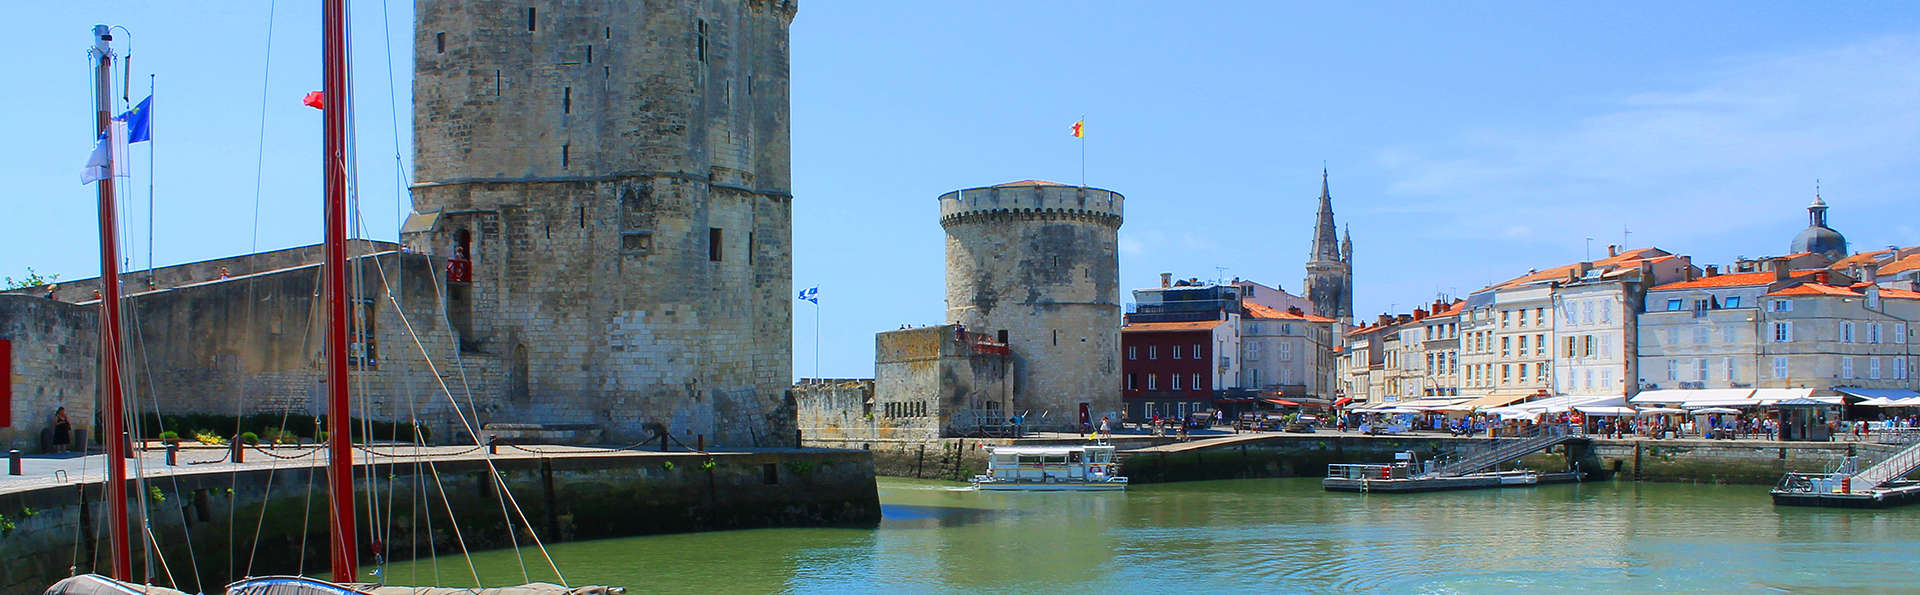 Hotel Kyriad La Rochelle Centre Ville - EDIT_Destination4.jpg